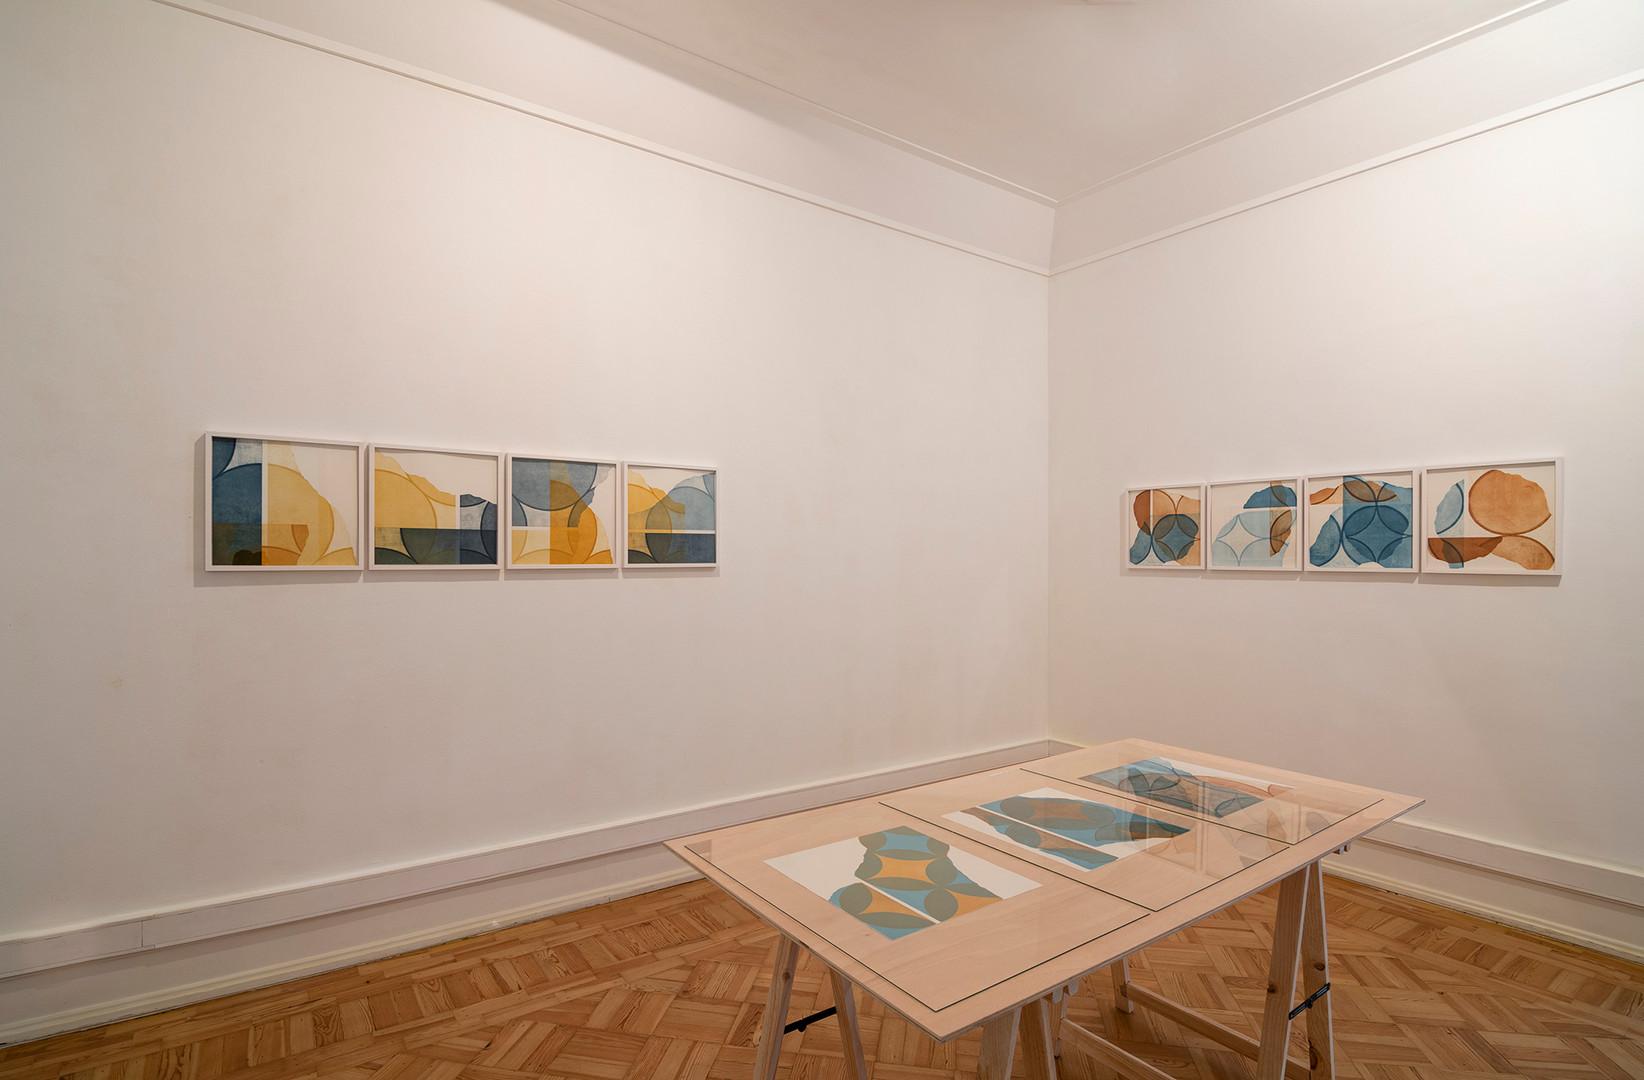 "Vista da exposição ""in a row I+II"" de Pedro Boese, 2020  © Eduardo Sousa Ribeiro, 2020  Esquerda: in a row I, 2020 Gravuras de Aquatinta a 4 cores sobre papel artesanal Bütten 340g 38,5 x 38,5 cm (mancha) cada 40 x 40 cm (moldura) Ed. de 6 + 1 PA  Direita: in a row II, 2020 (parede do fundo) Gravuras de Aquatinta a 4 cores sobre papel artesanal Bütten 340g 38,5 x 38,5 cm (mancha) cada 40 x 40 cm (moldura) Ed. de 6 + 1 PA  Na mesa: Sem Título, 2017 (lado esquerdo) Gravura de Aquatinta sobre papel Zerkall Bütten de 340g 38 x 36 cm Prova única  Sem Título, 2019 (no meio) Gravura de Aquatinta sobre papel Zerkall Bütten de 340g 38,5 x 38,5 cm Ed. 1/6  modultypIV_38,5_r18_w90, 2019 (lado direito) Gravura de Aquatinta sobre papel Zerkall Bütten de 340g 38,5 x 38,5 cm Ed. 2/6"